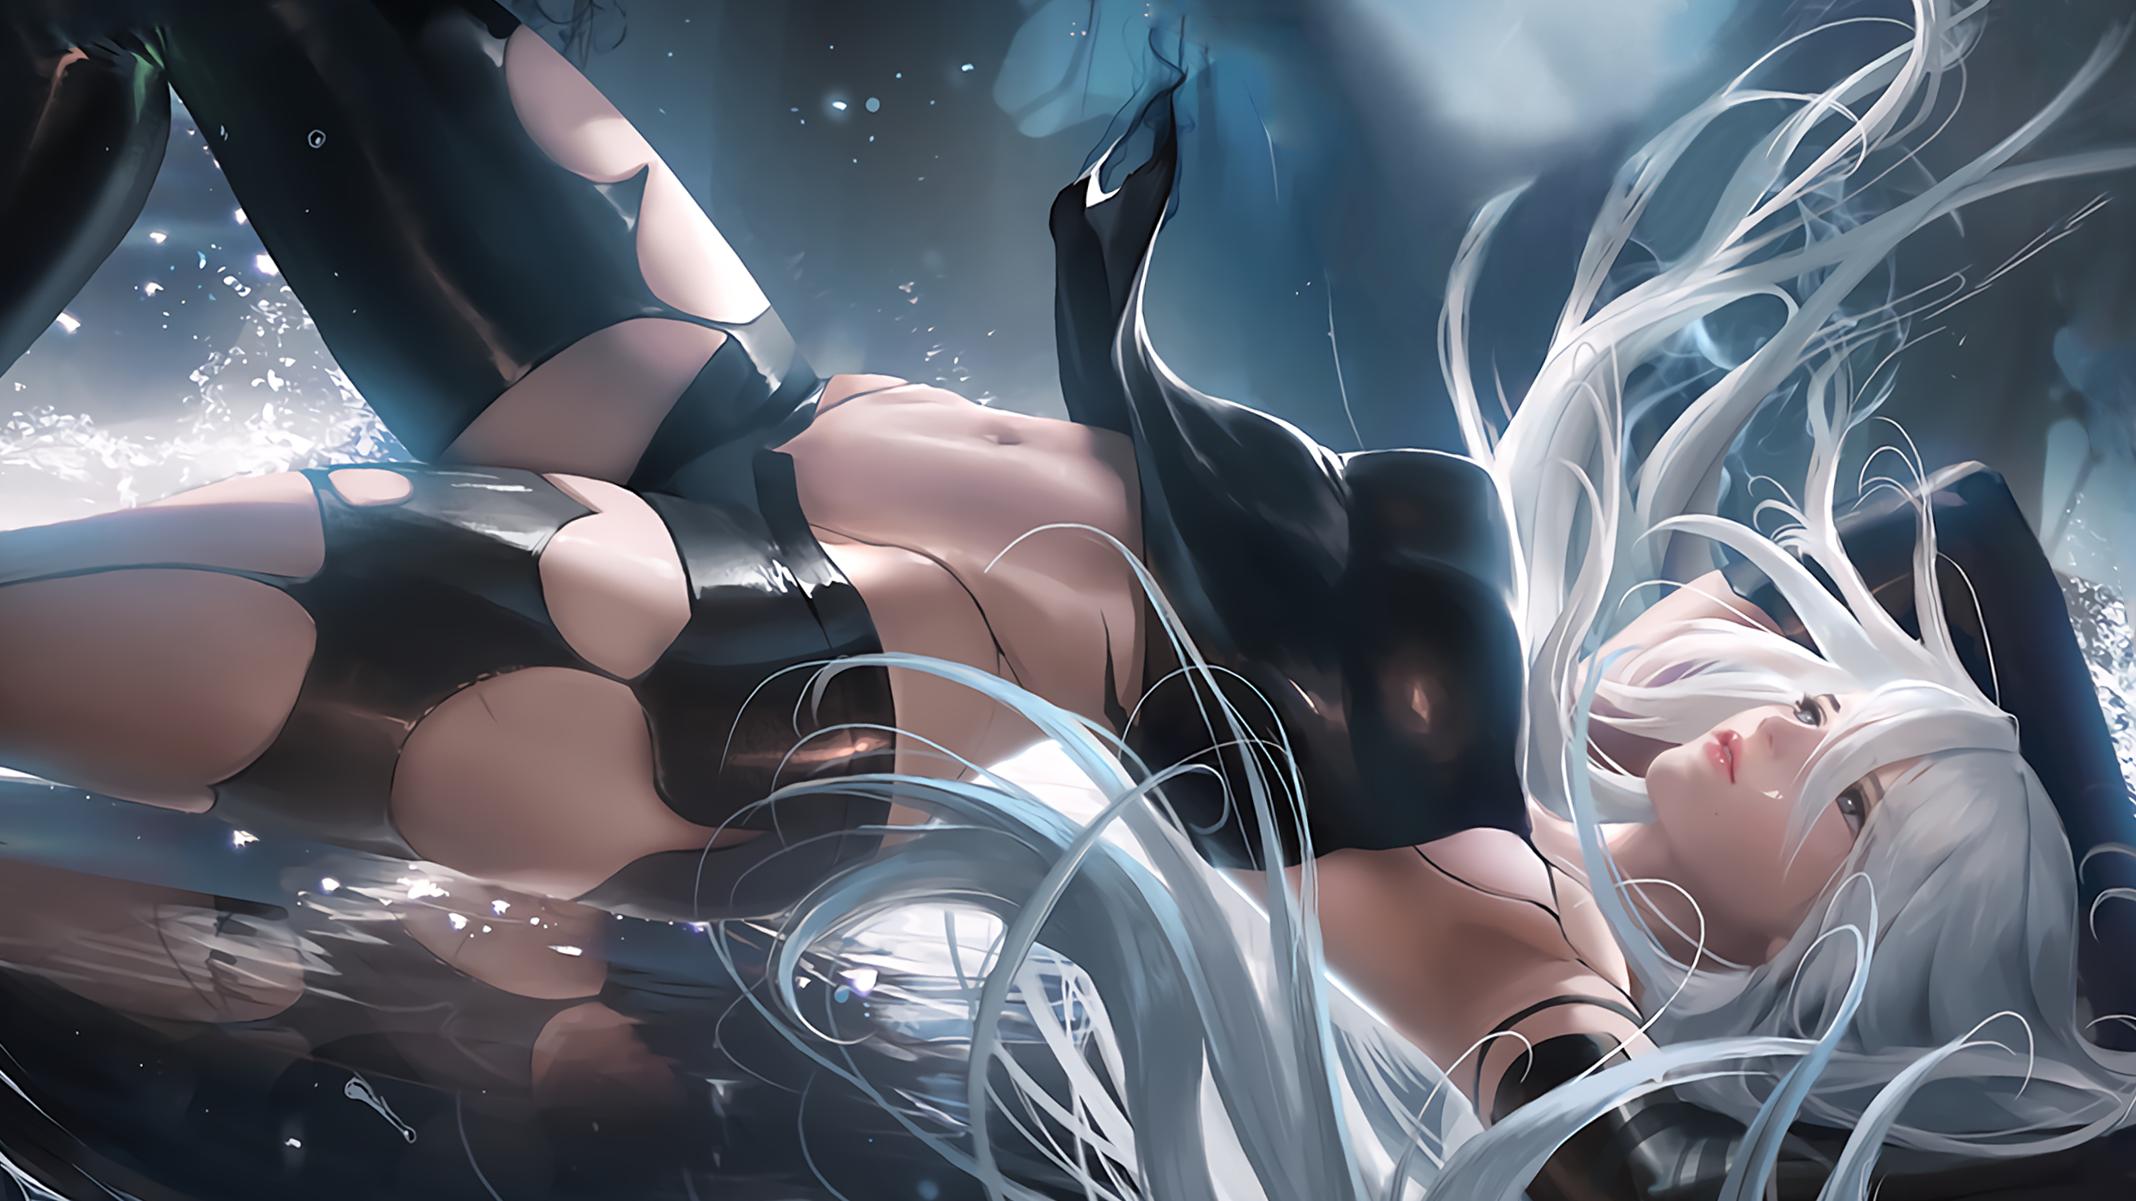 Anime 2136x1201 A2 (Nier: Automata) video games fan art Nier: Automata white hair NieR human android long hair digital art belly lying down Sakimichan torn clothes water